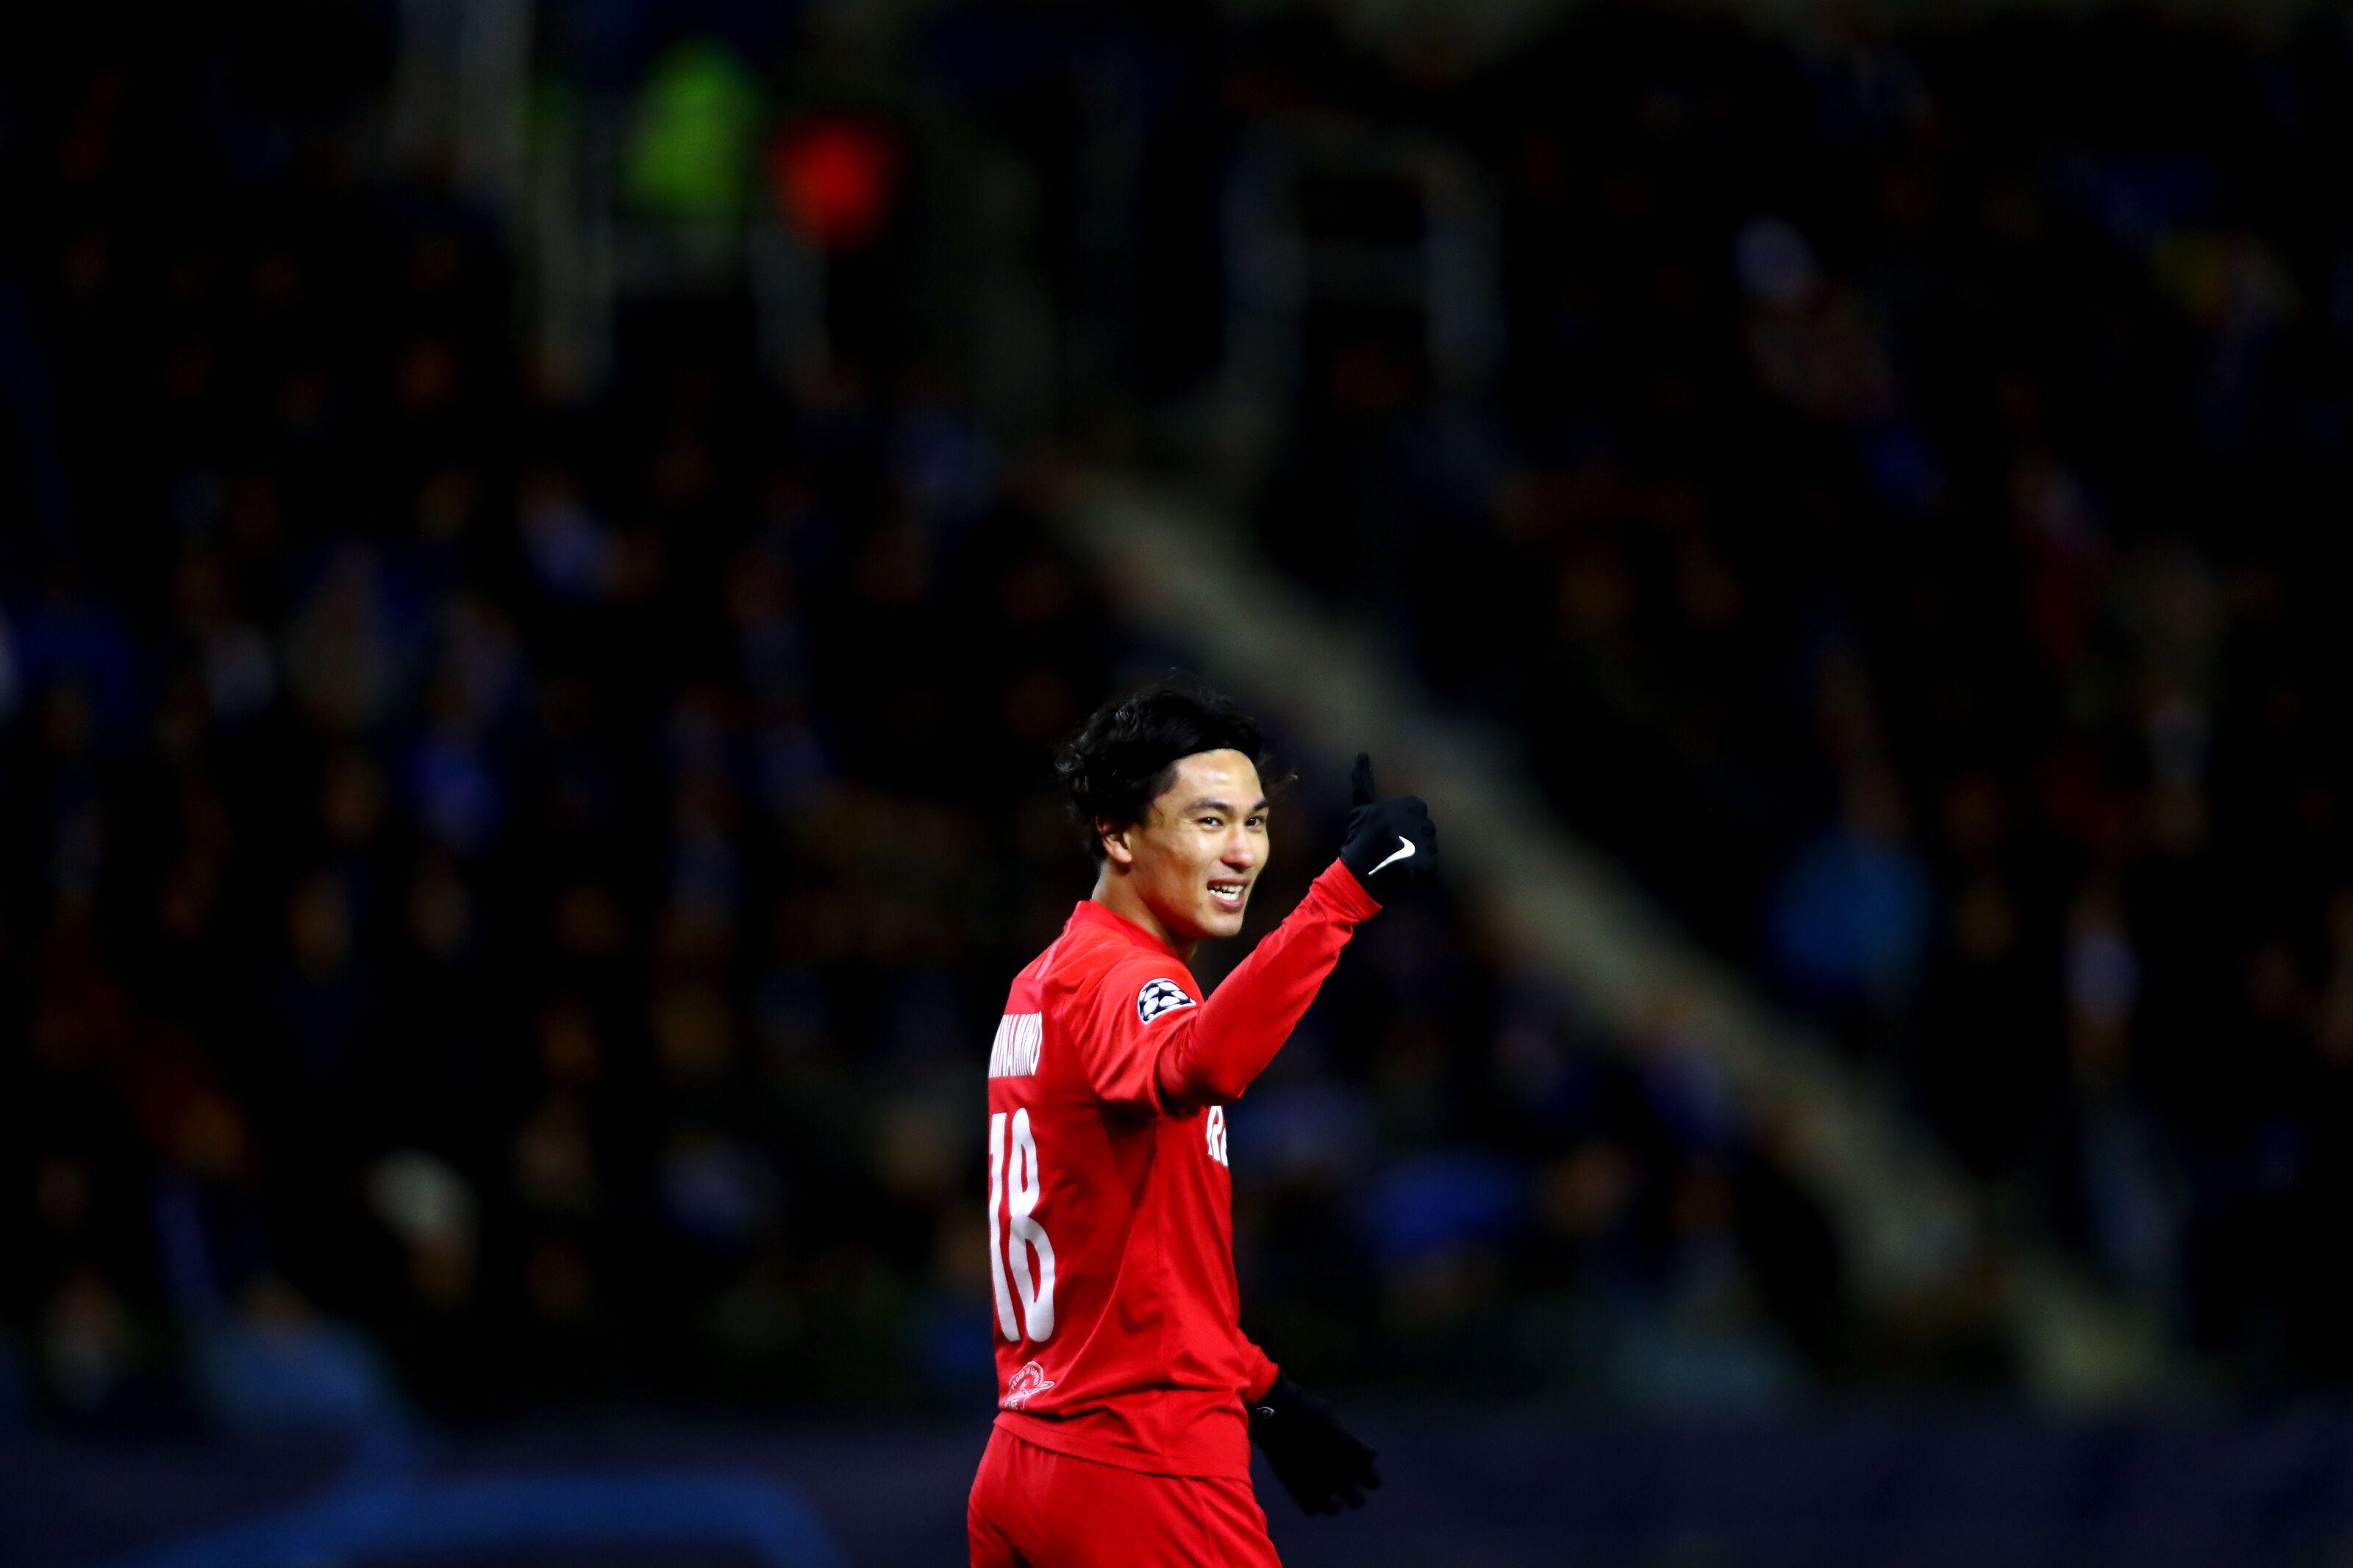 Liverpool beats a host of European clubs to Takumi Minamino's signature